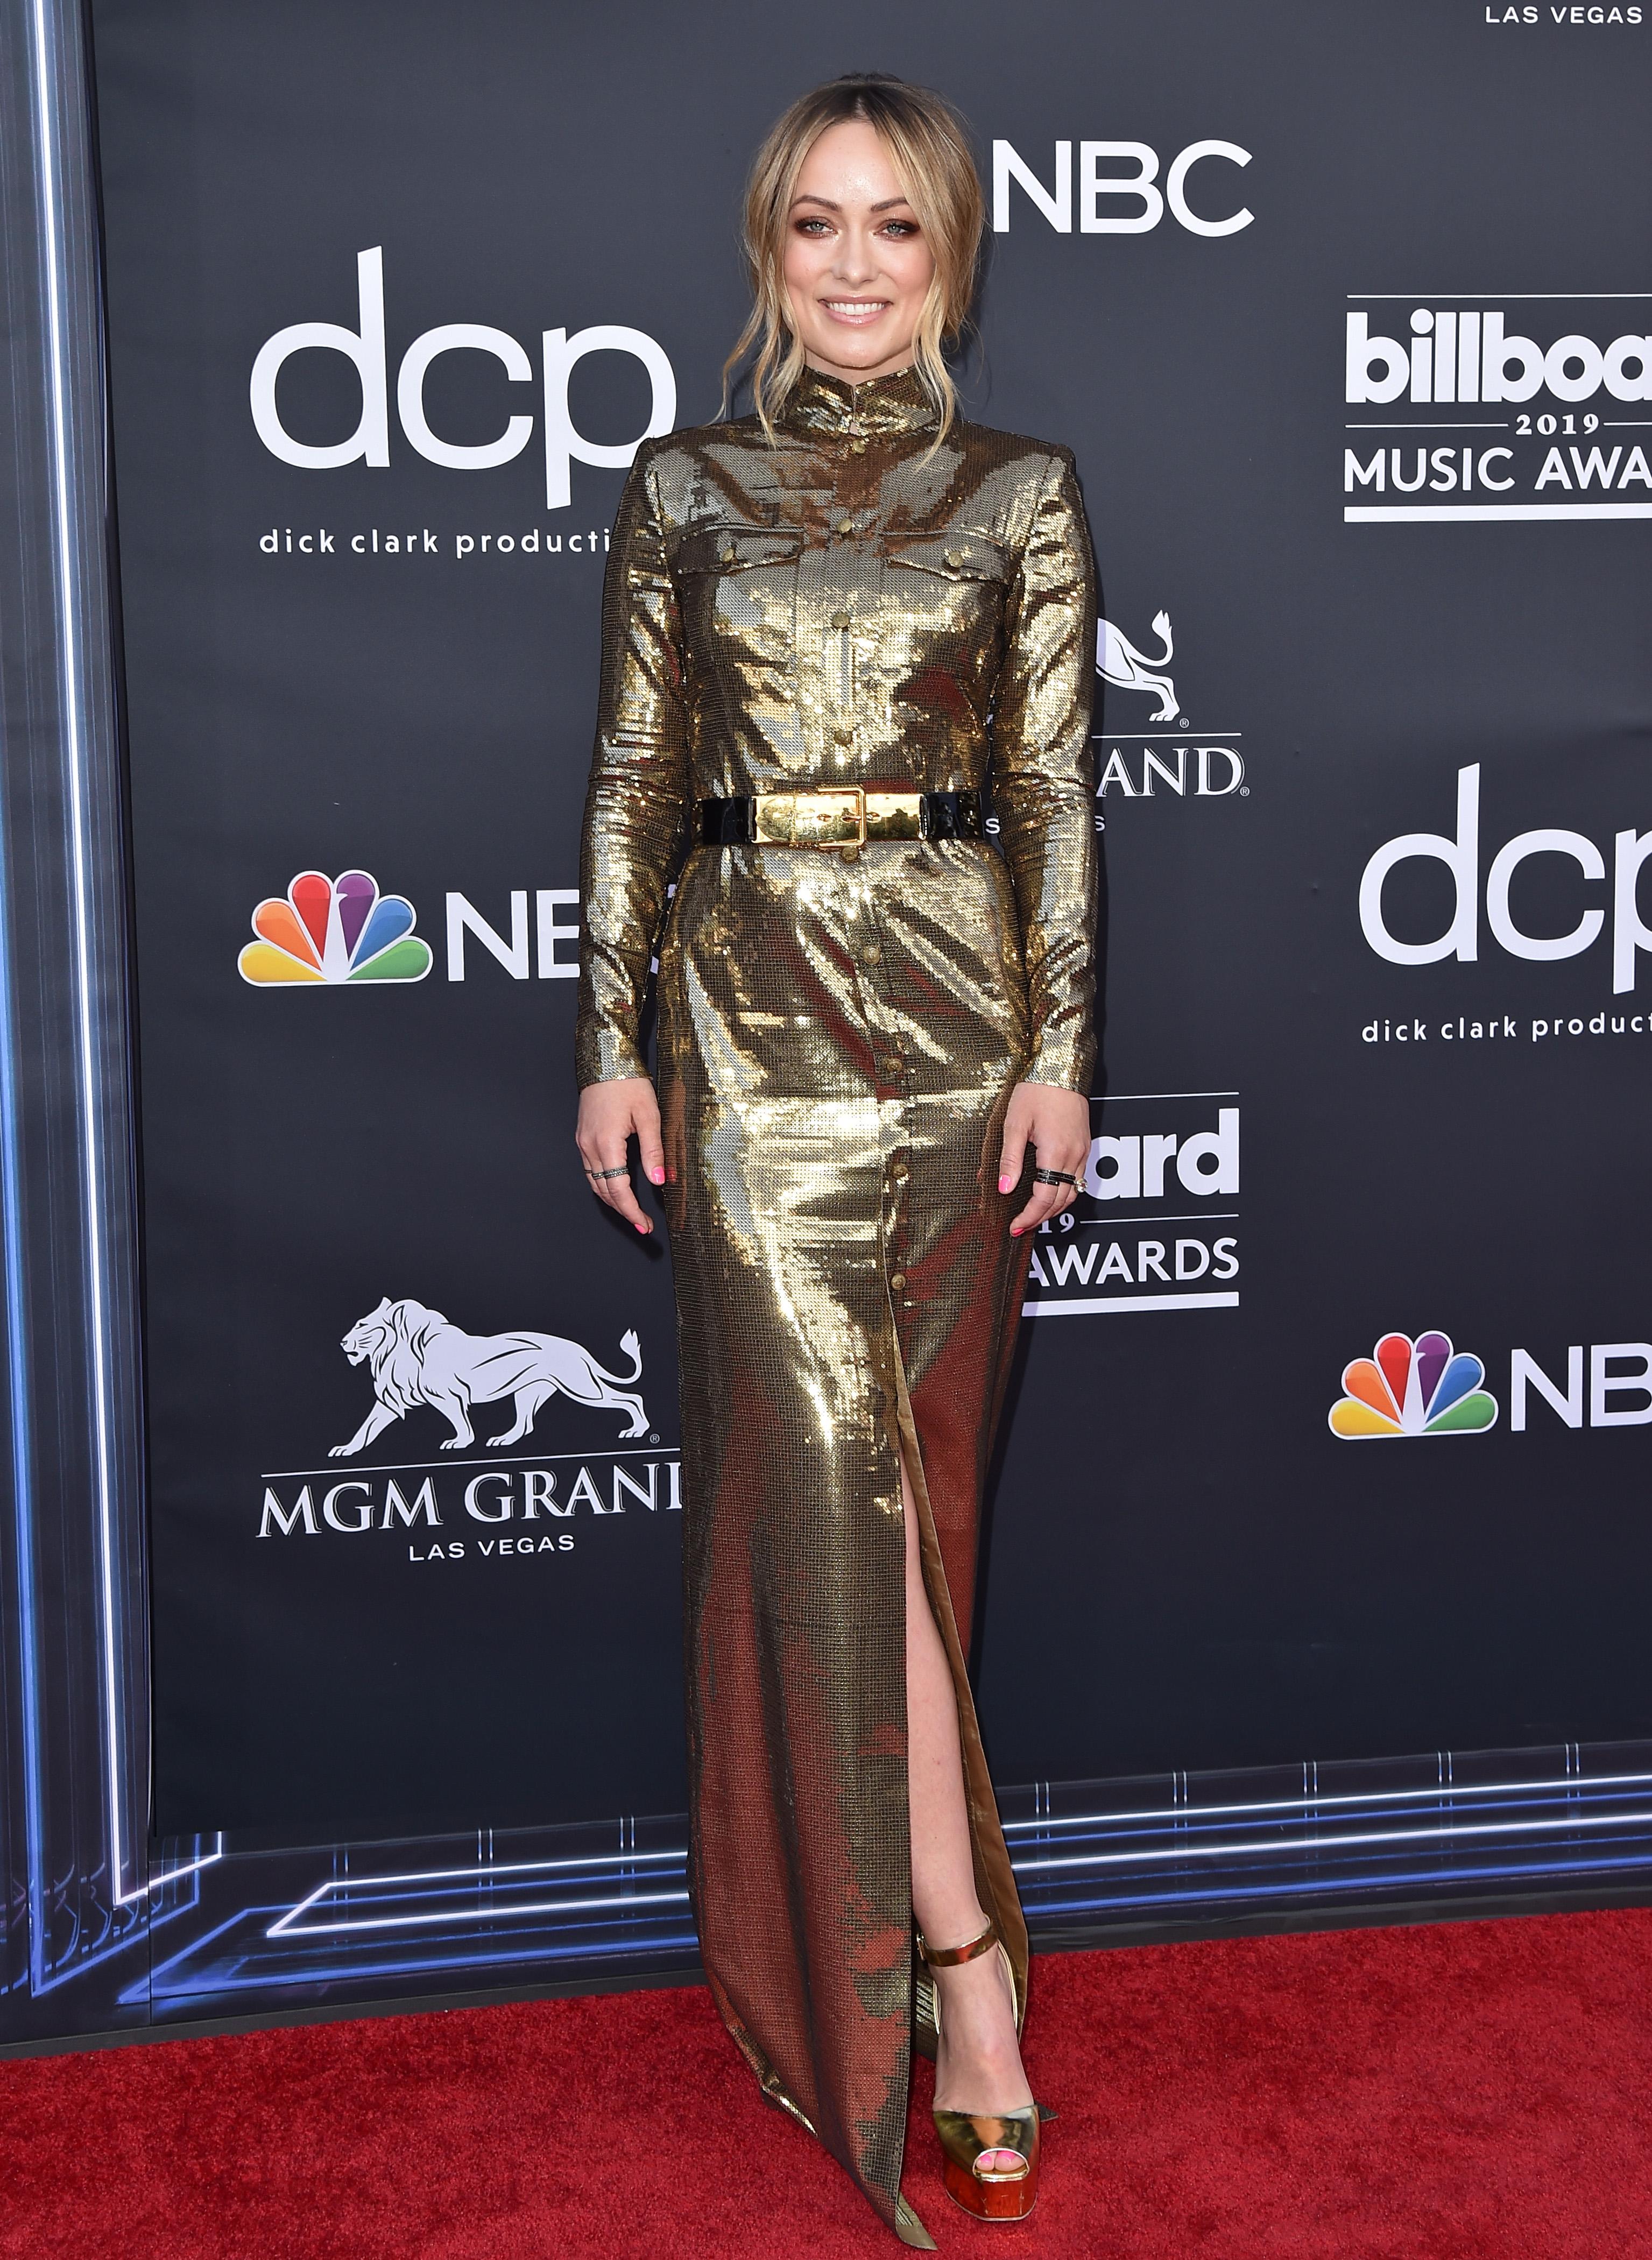 alfombra roja, vestido, red carpet, Billboard awards 2019, premios Billboard